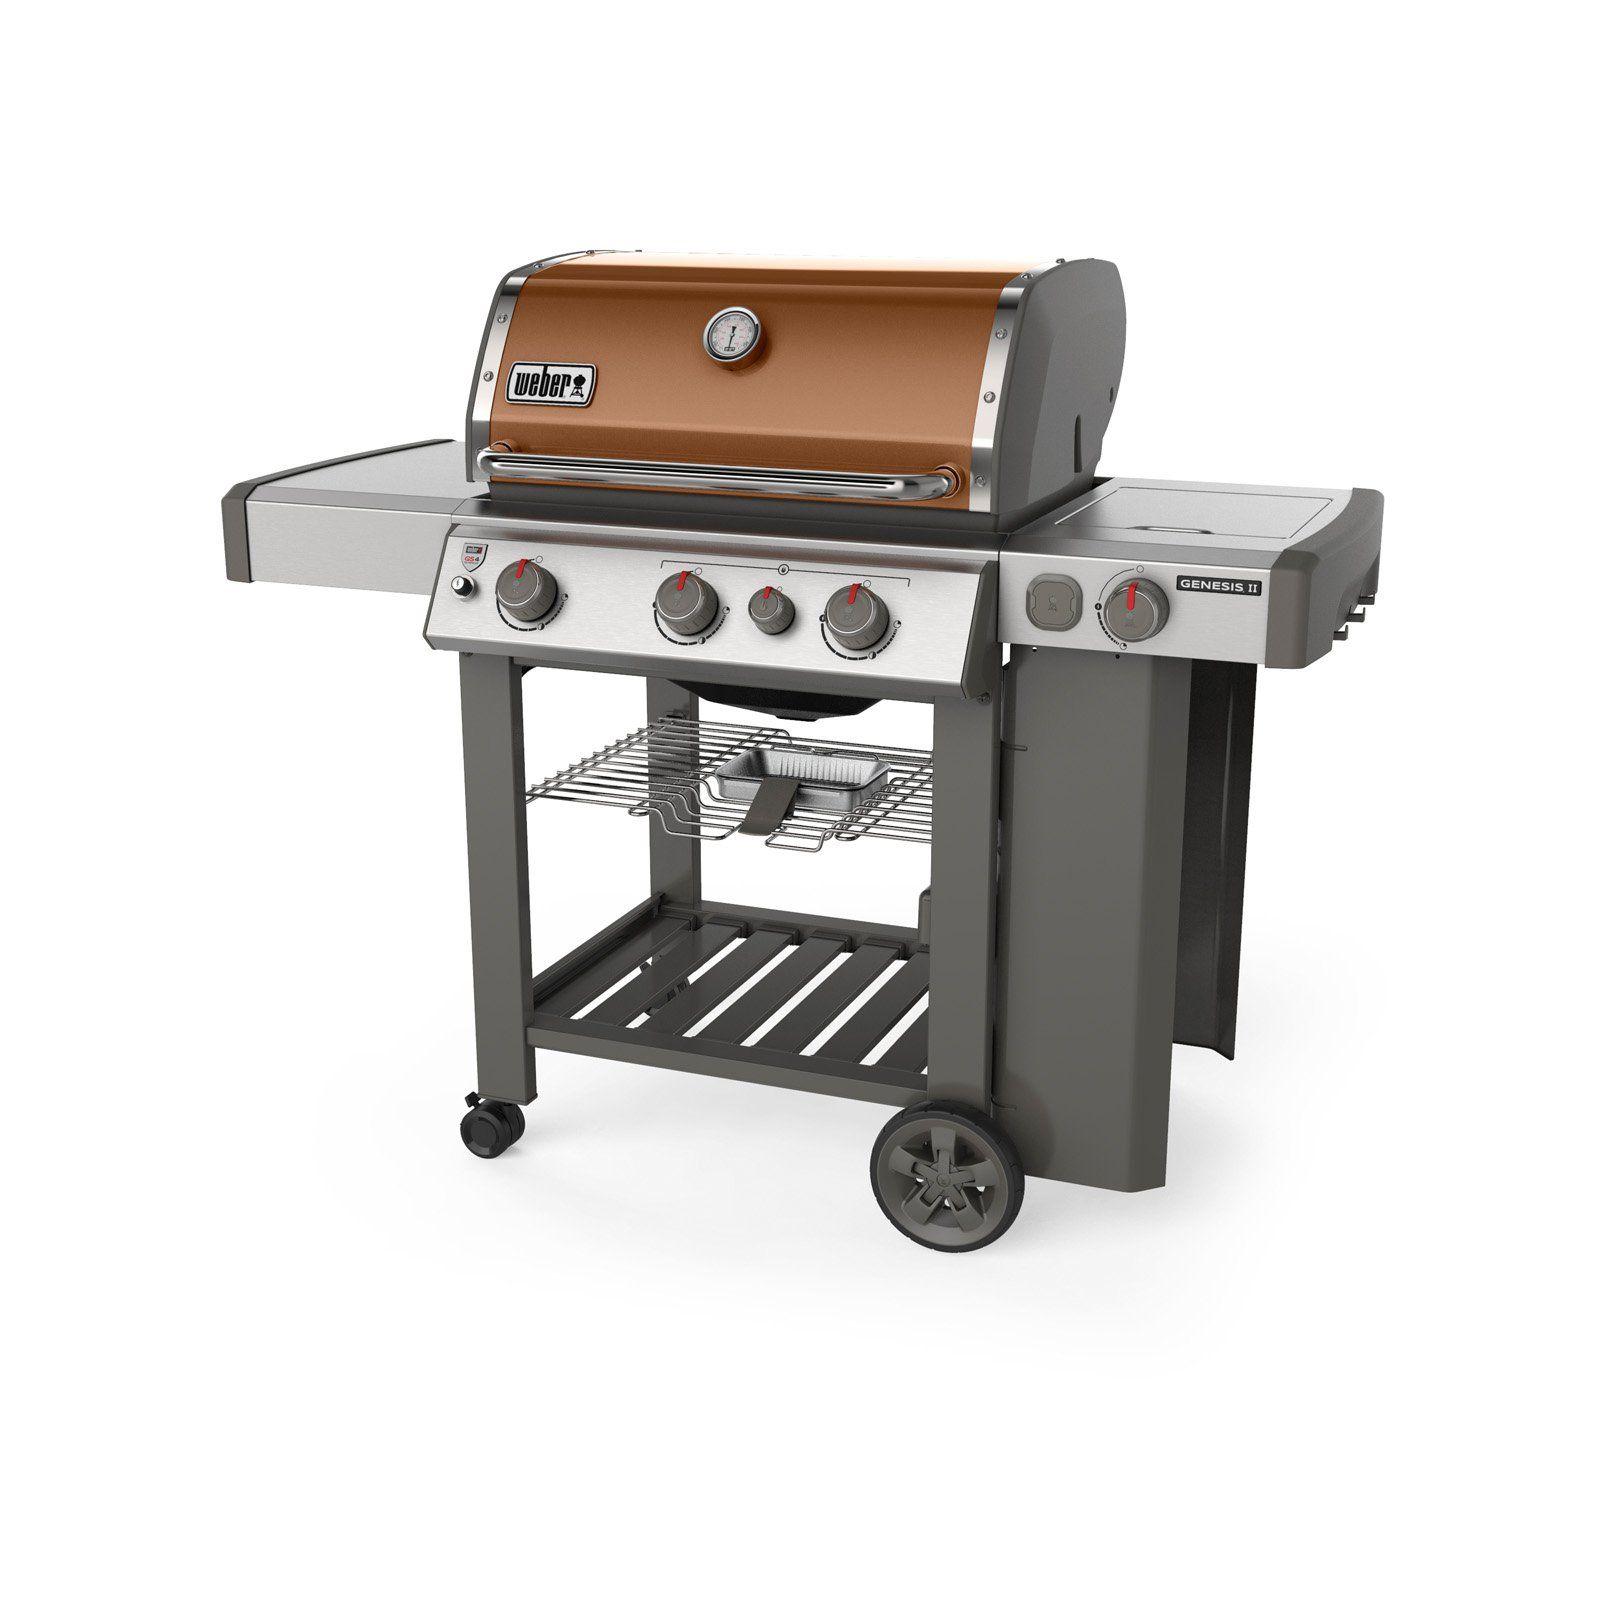 Weber Genesis Ii E 330 3 Burner Gas Grill Copper Propane Gas Grill Grilling 3 Burner Gas Grill